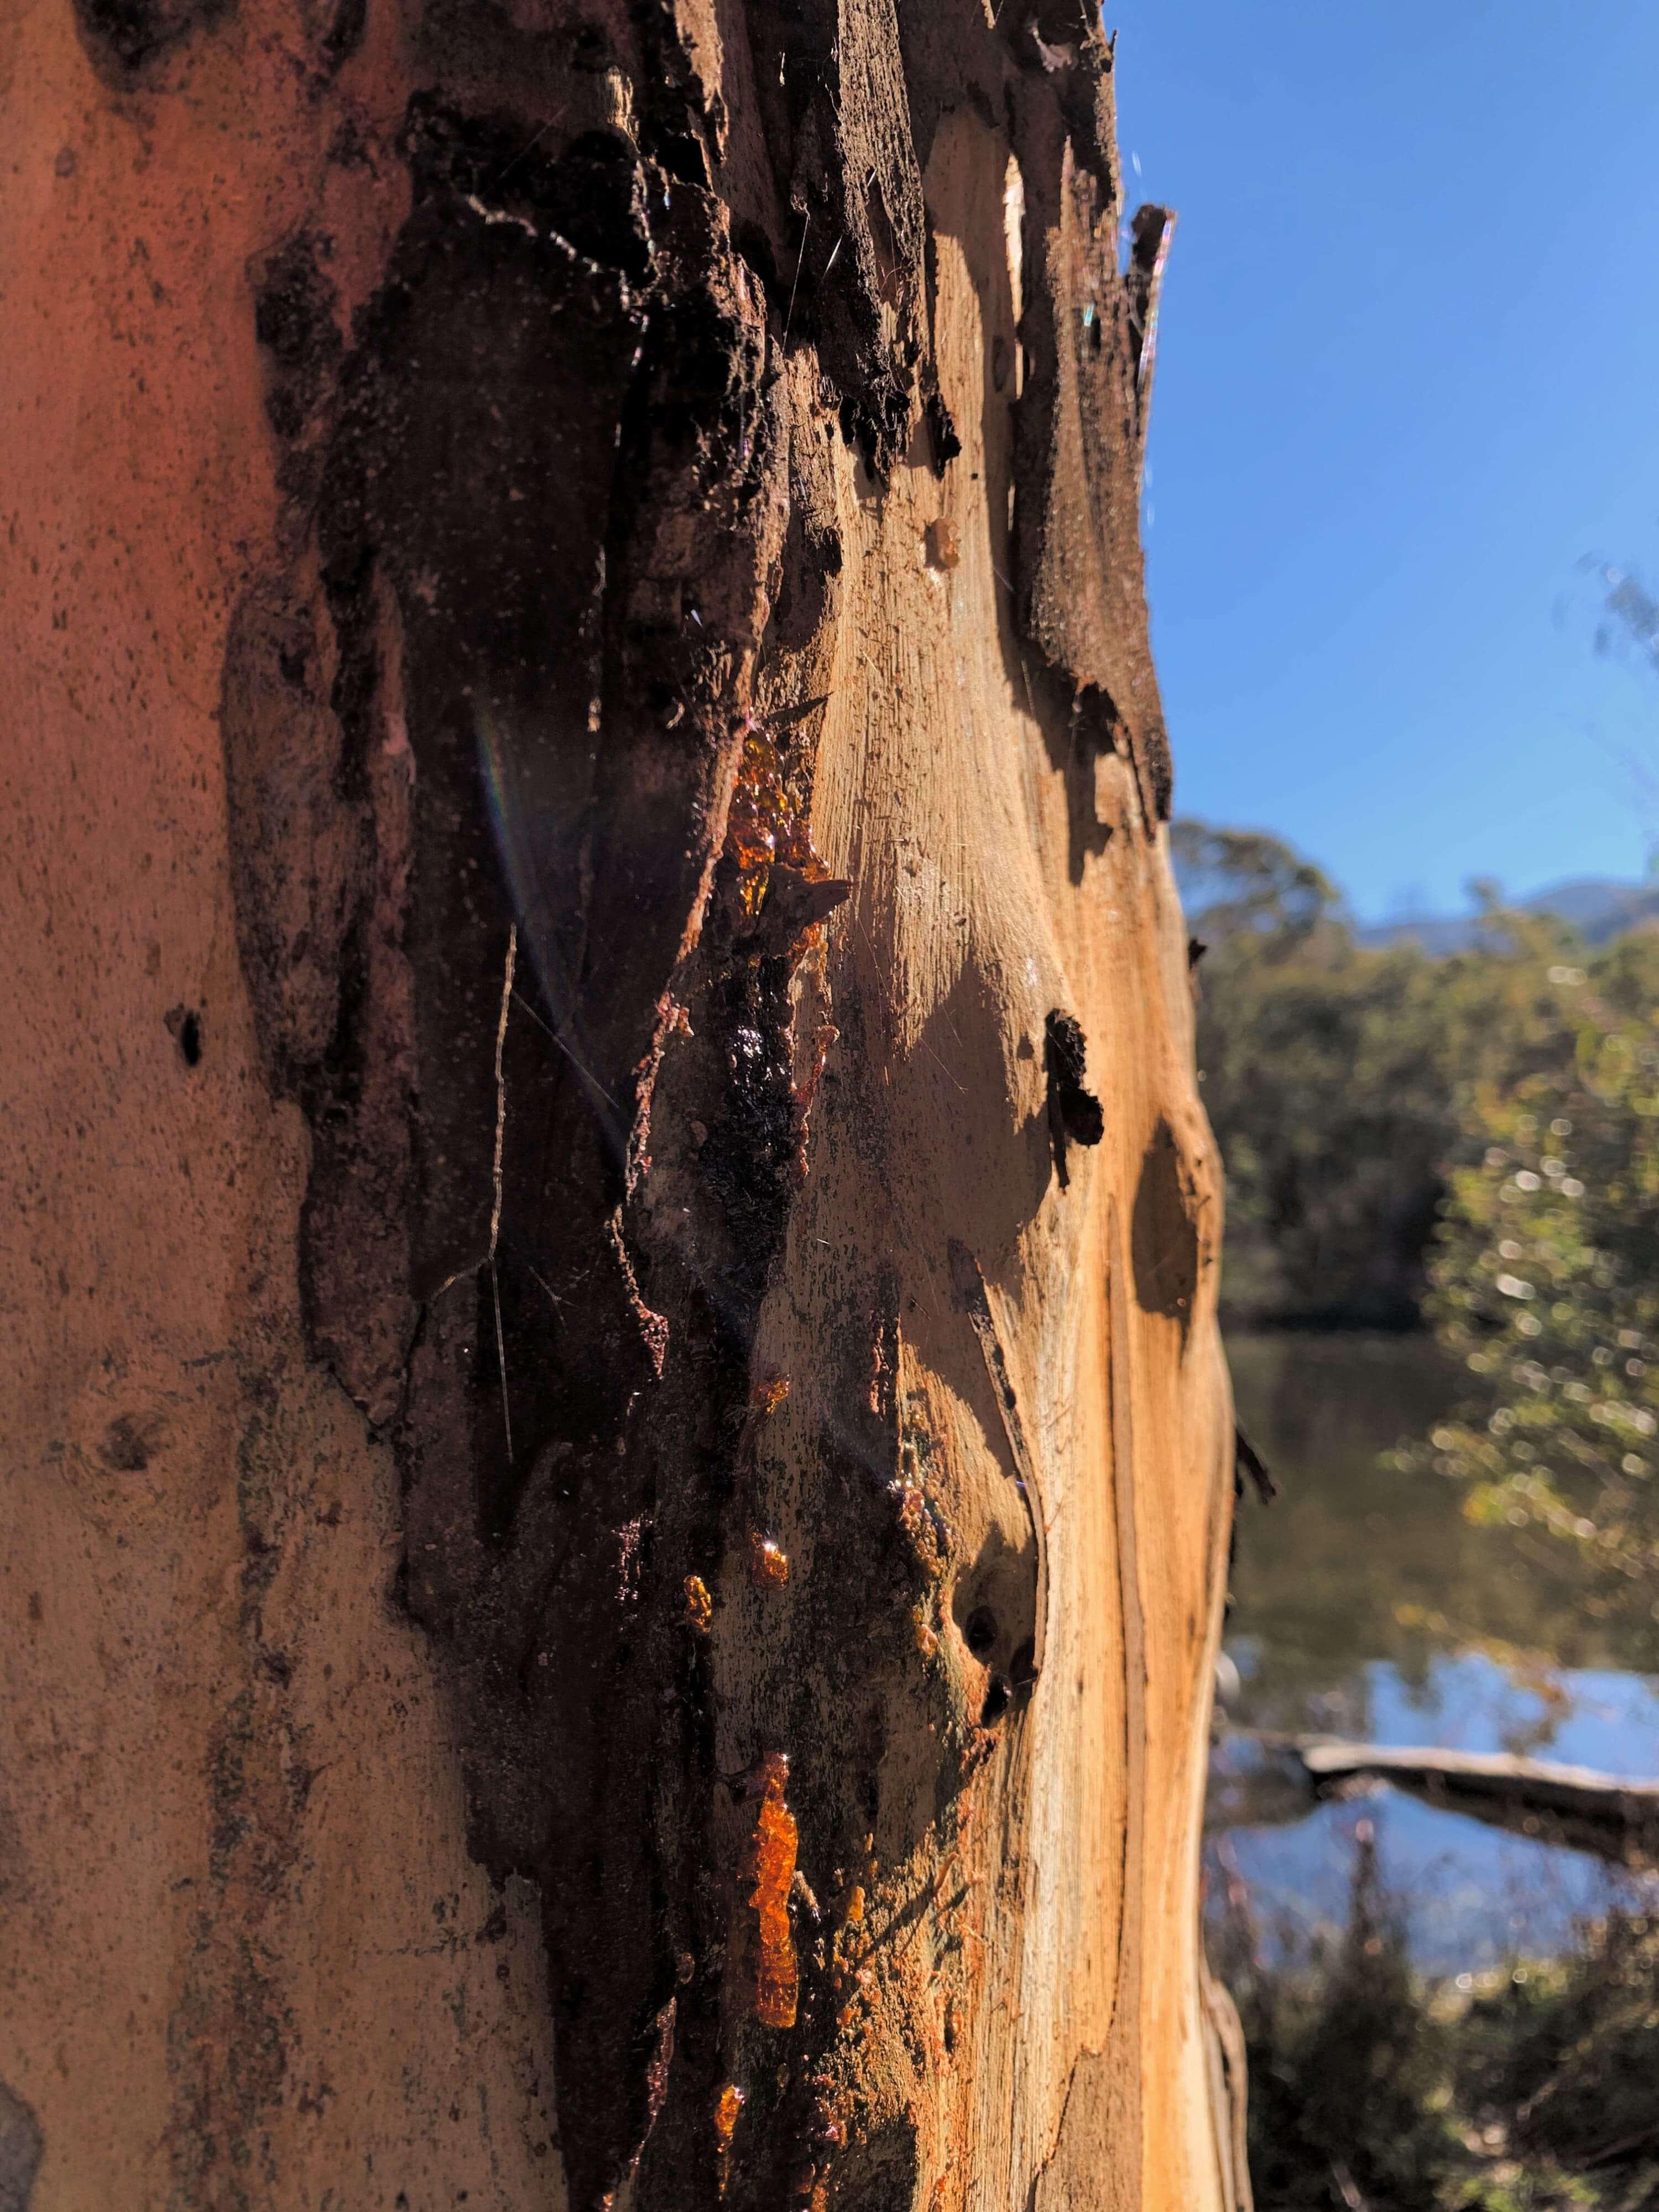 crystalised gum on a eucalptus tree - Tidbinbilla Nature Reserve, Canberra